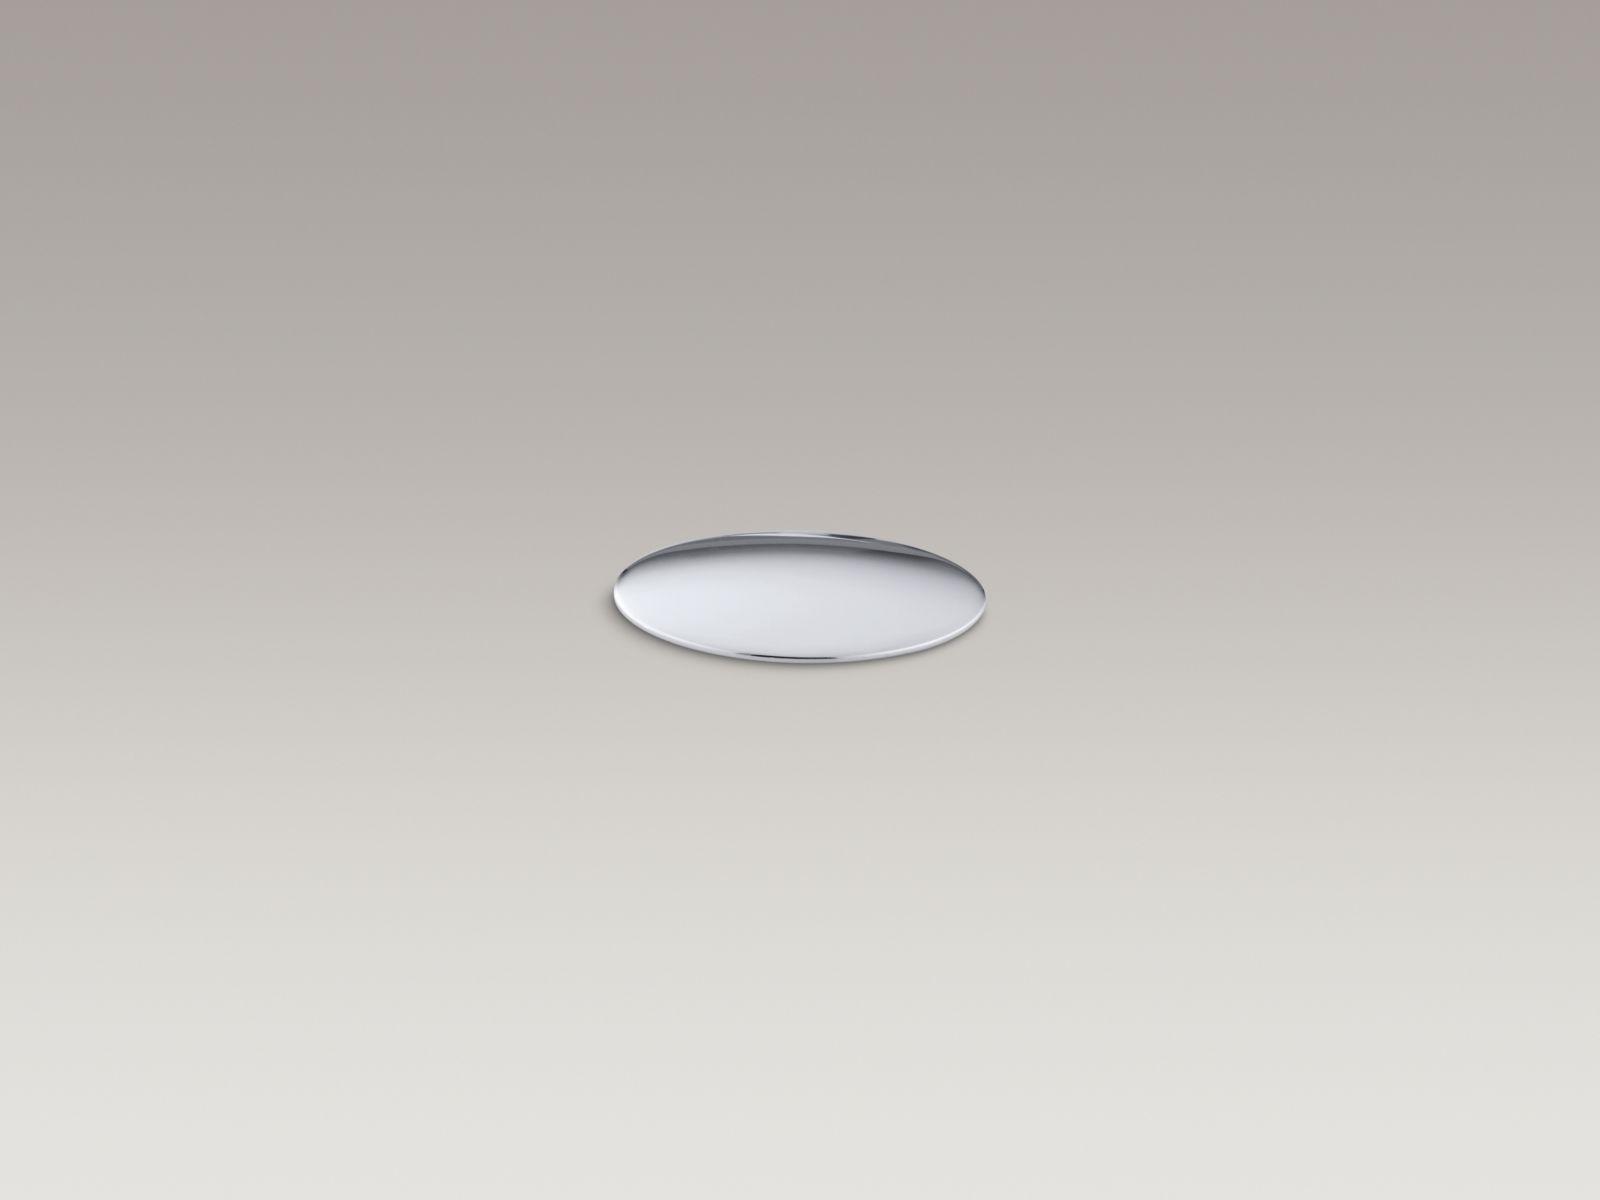 Kohler K-8830-CP Kitchen and Bathroom Sink Extra Hole Cover Polished Chrome